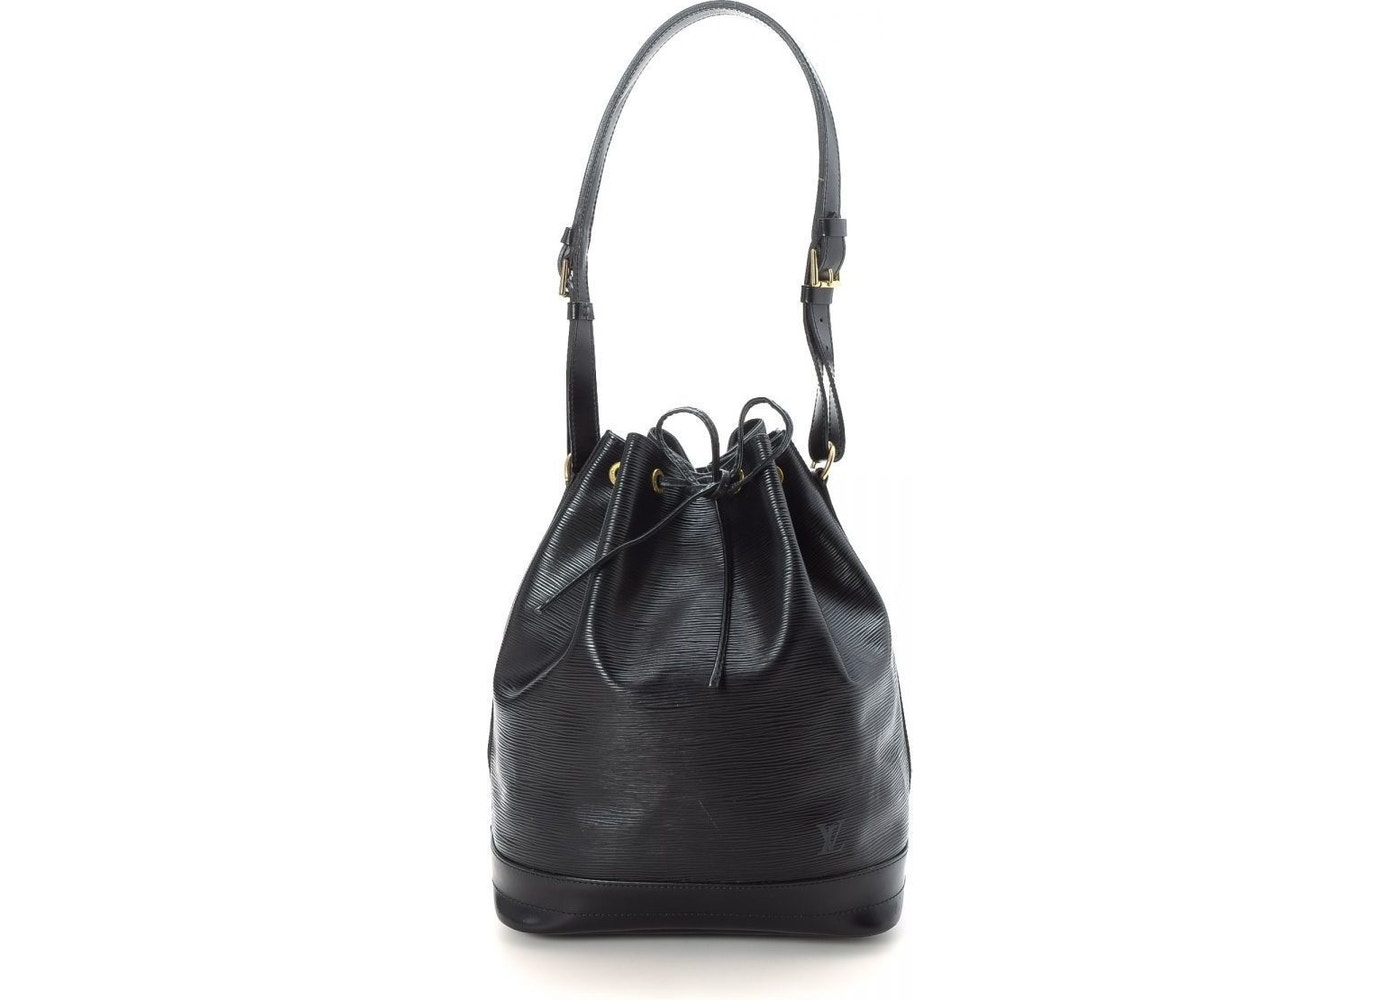 1f78ad164162 Louis Vuitton Noe Epi Large Black. Epi Large Black